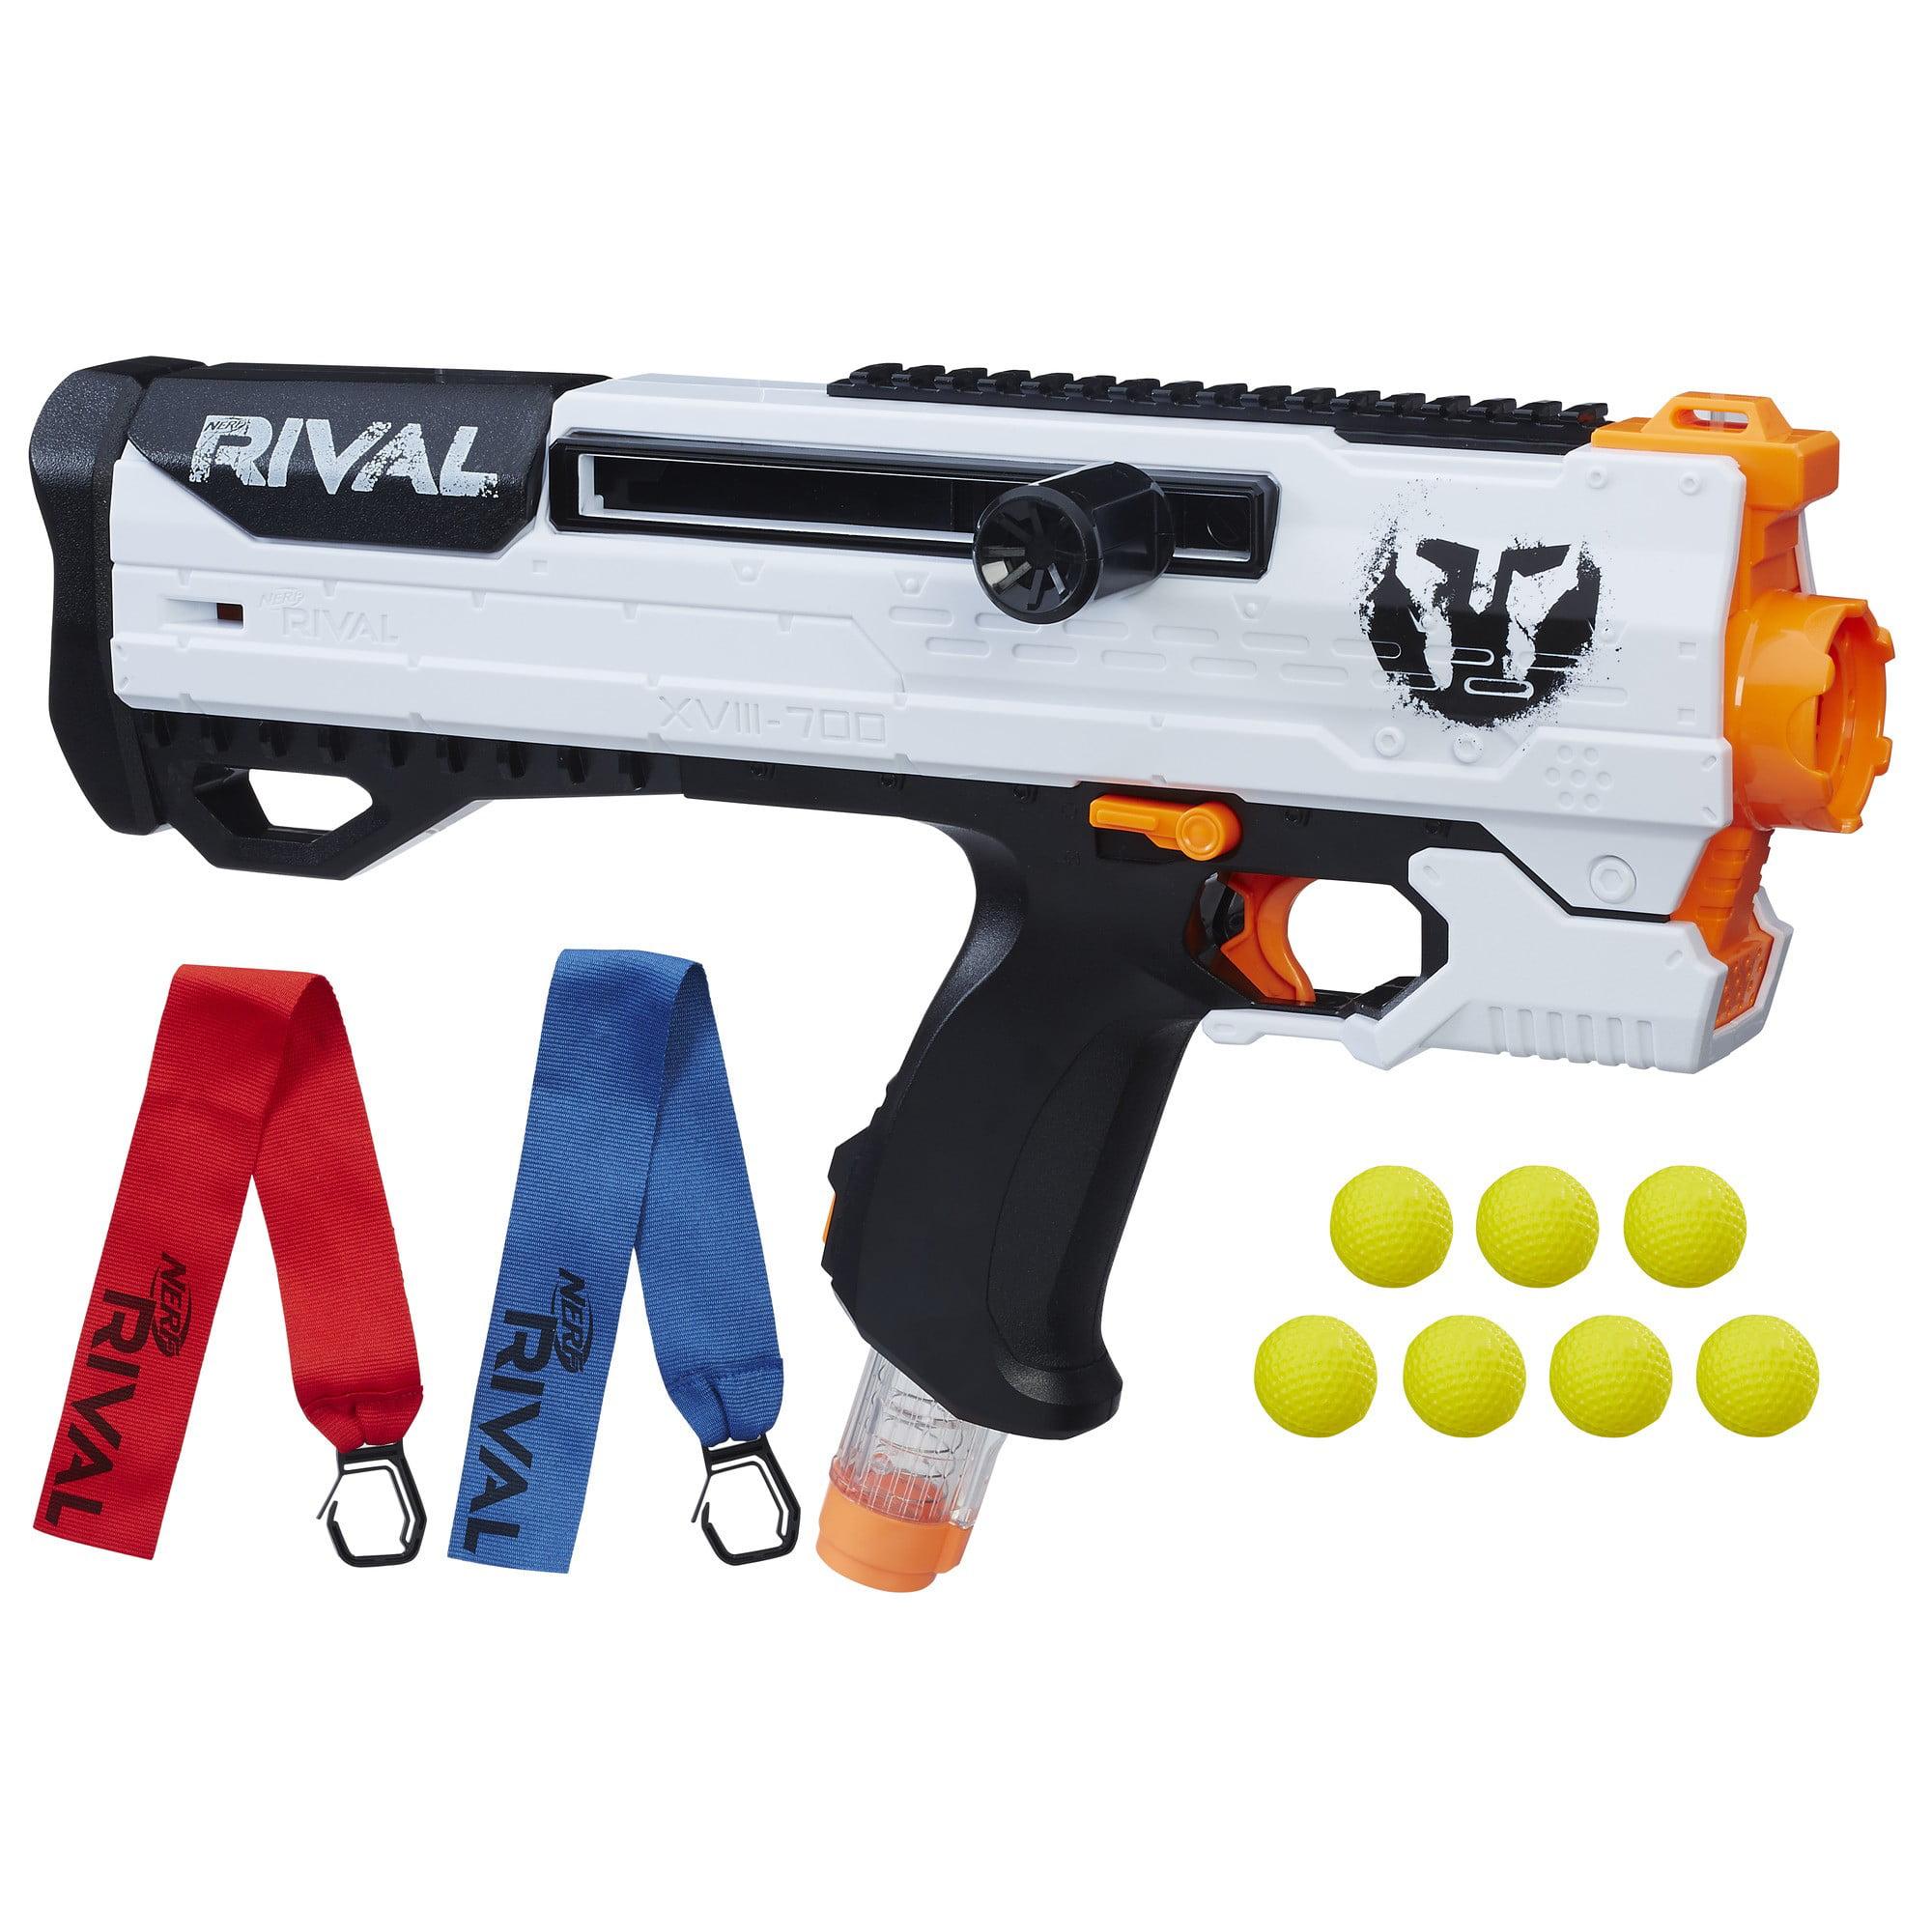 Nerf Rival Phantom Corps Helios XVIII-700 Blaster with 7